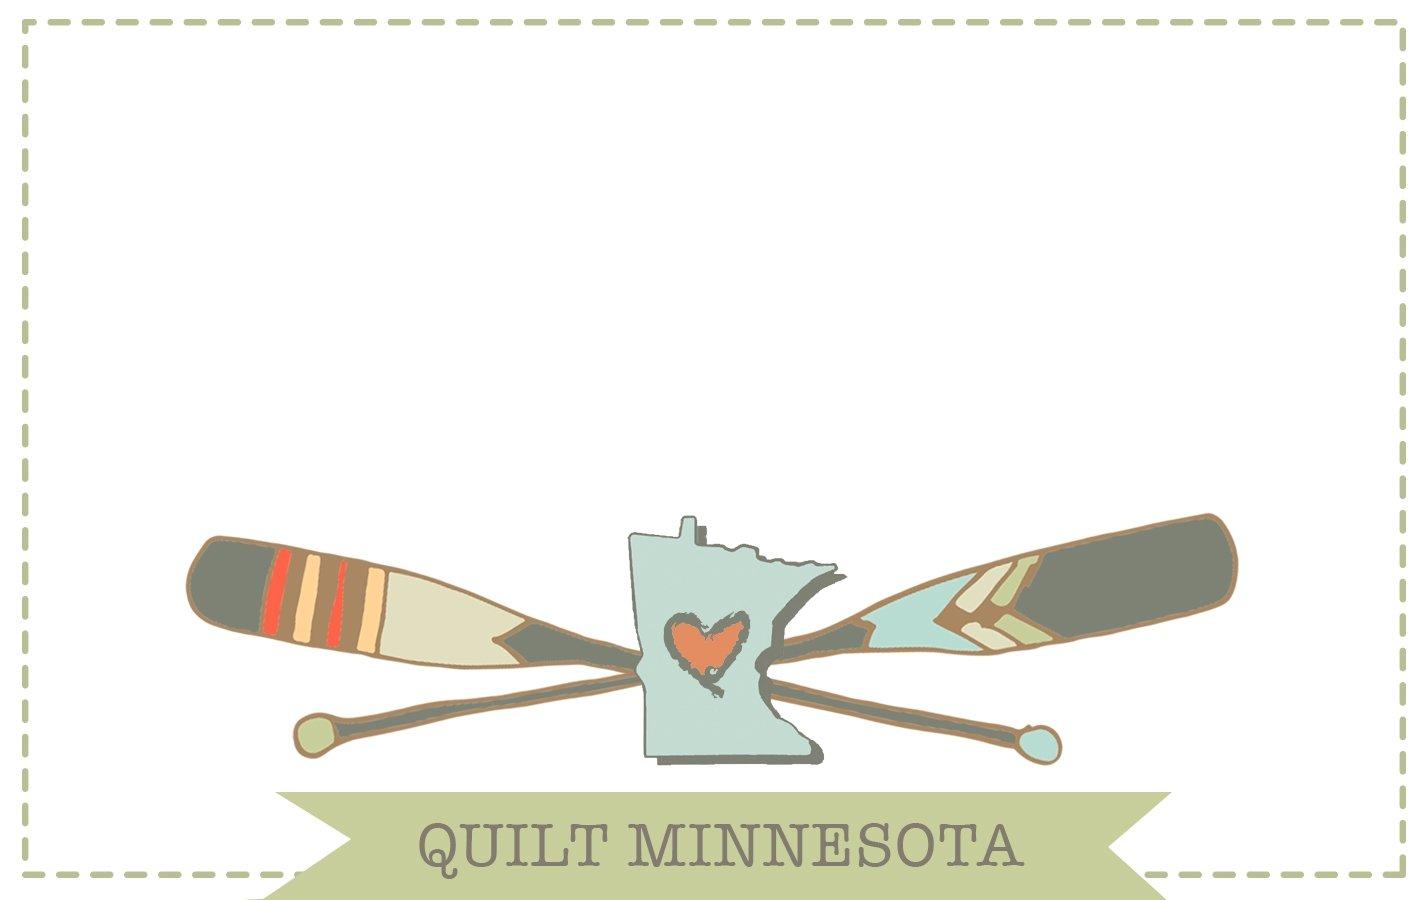 2016 Quilt Label, Oars